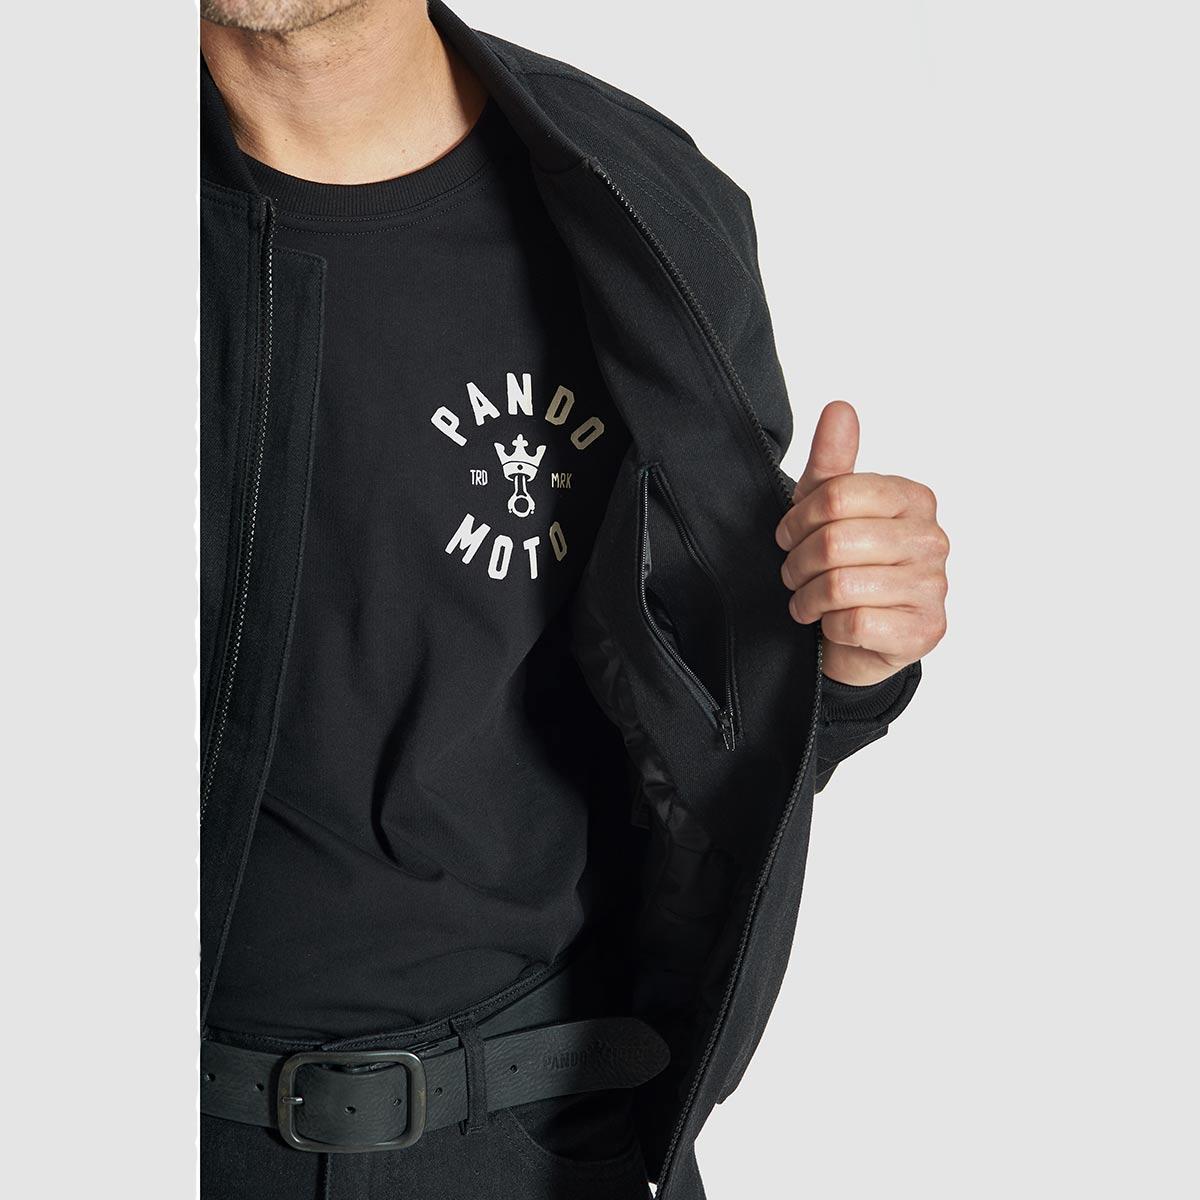 Pando Moto Bomber Cor 01 Jacket